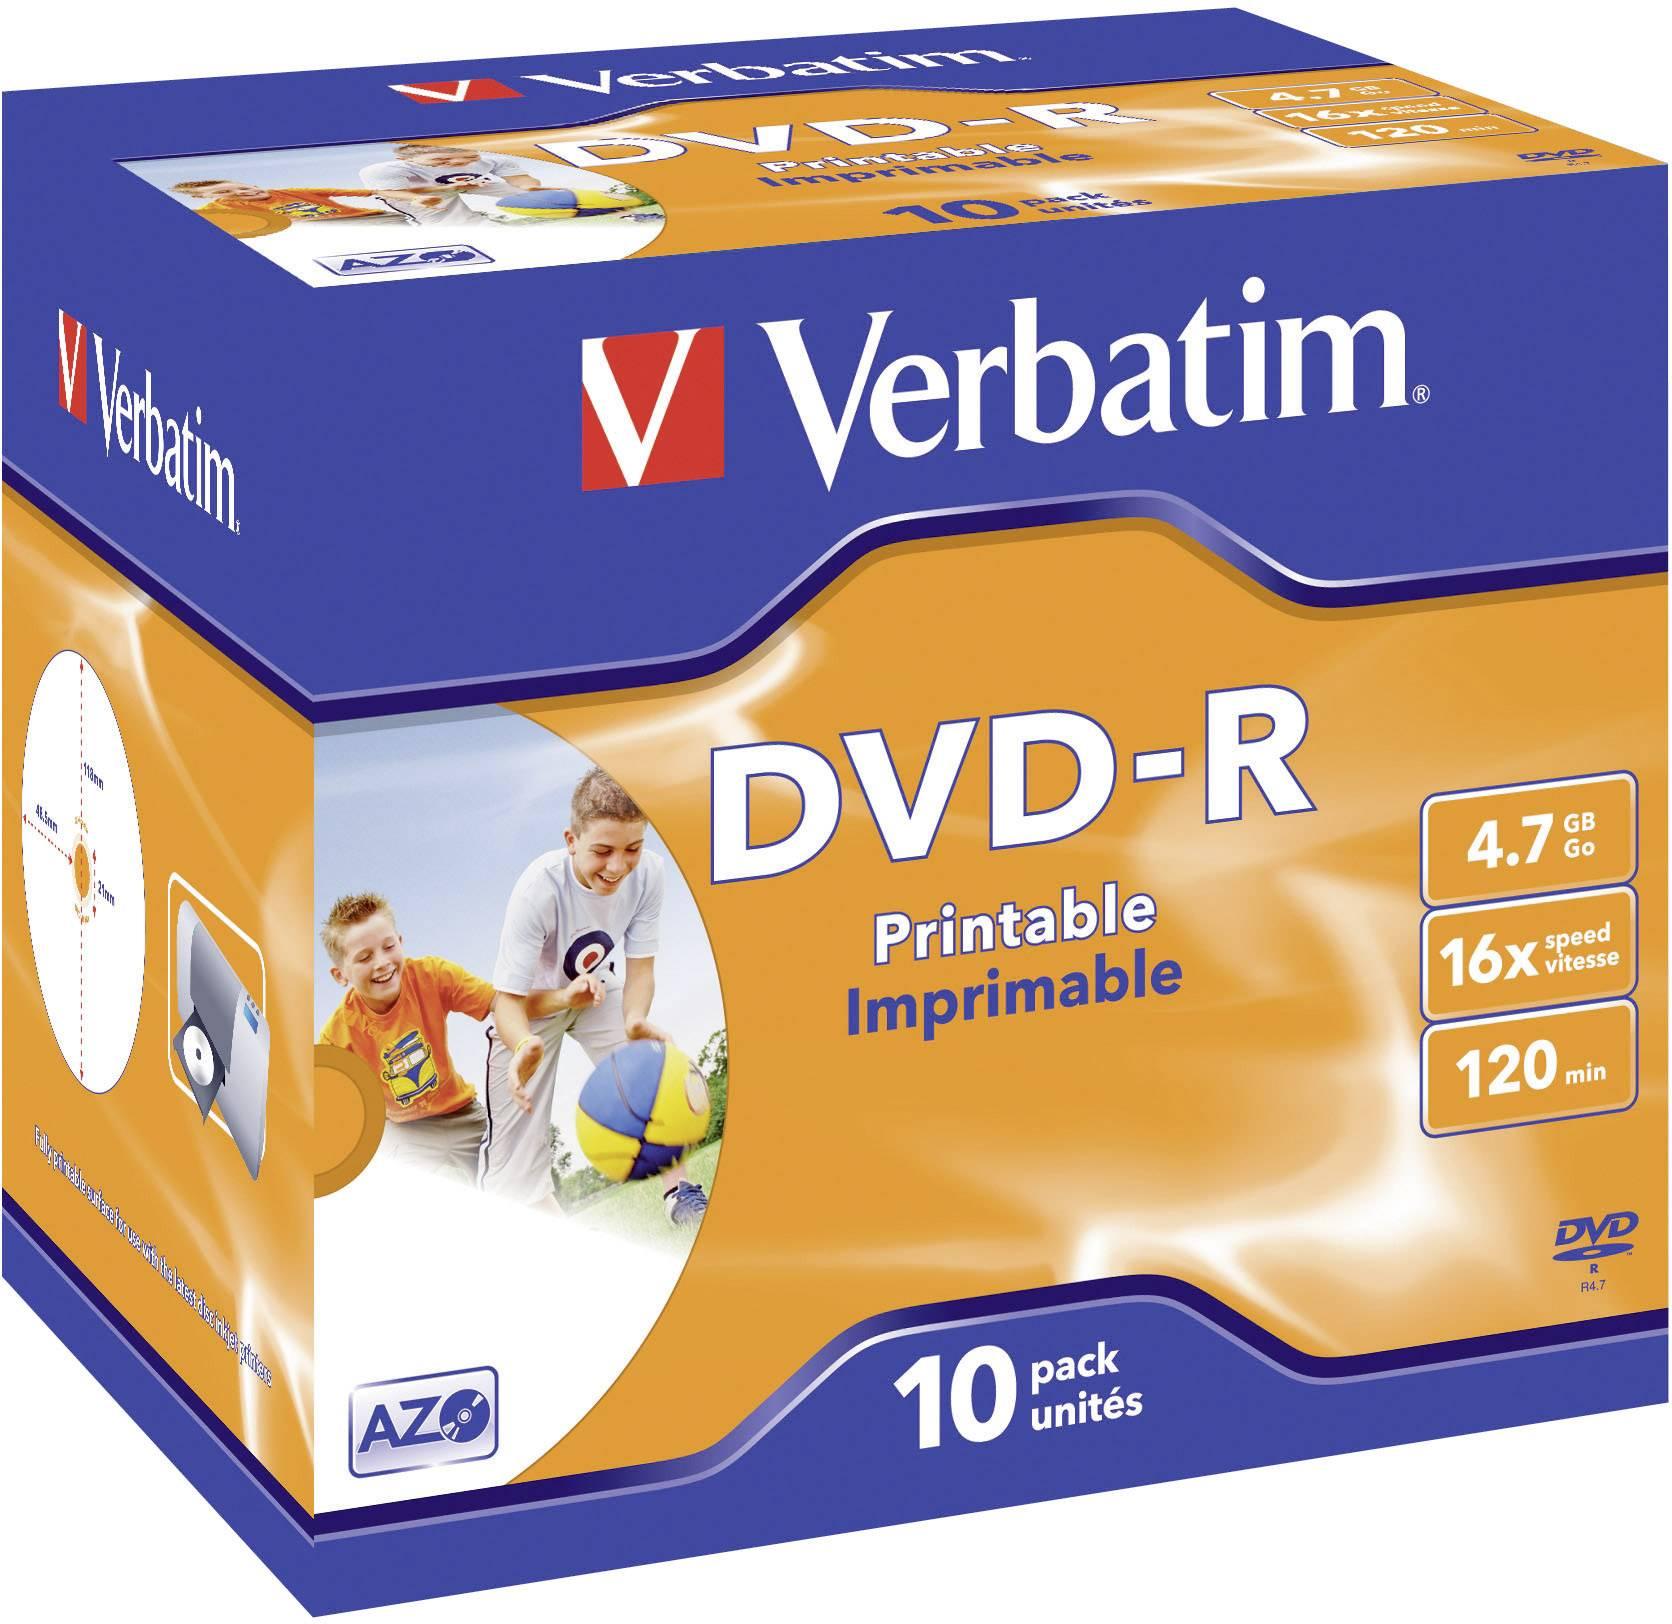 DVD-R 4.7 GB Verbatim 43521, možnosť potlače, 10 ks, Jewelcase